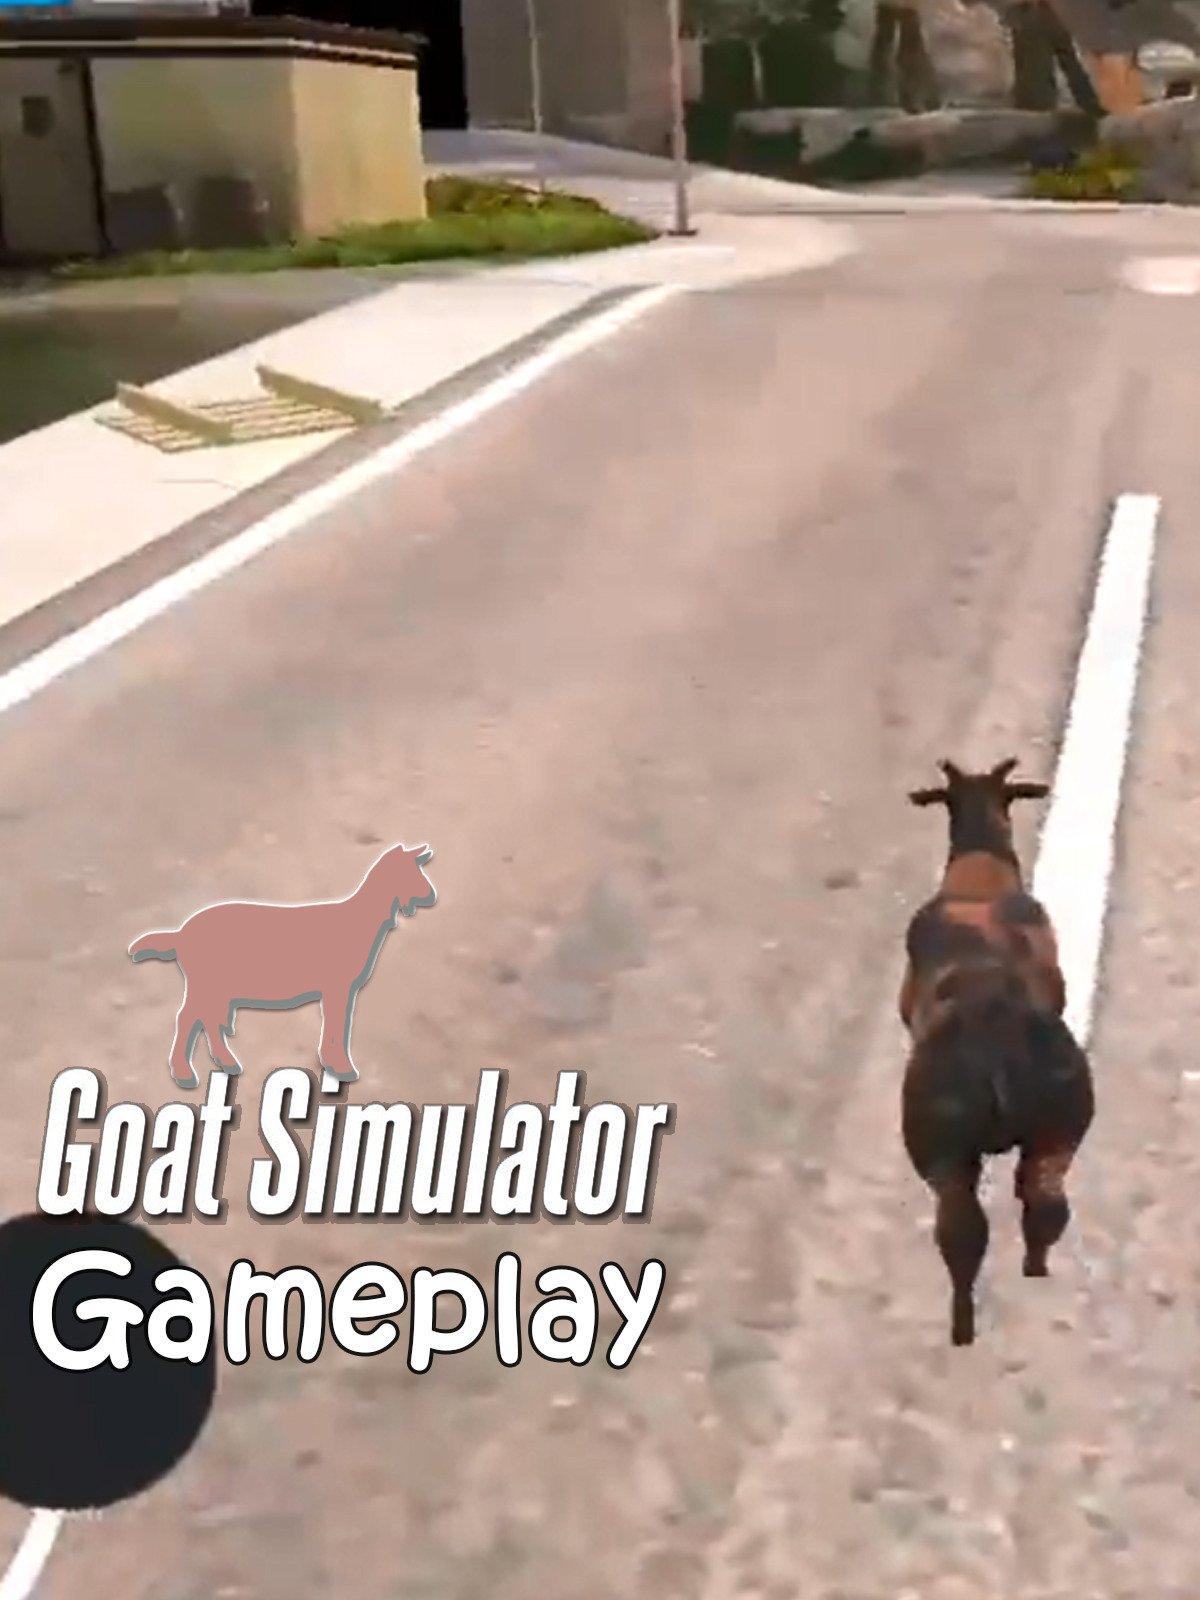 Clip: Goat Simulator Gameplay